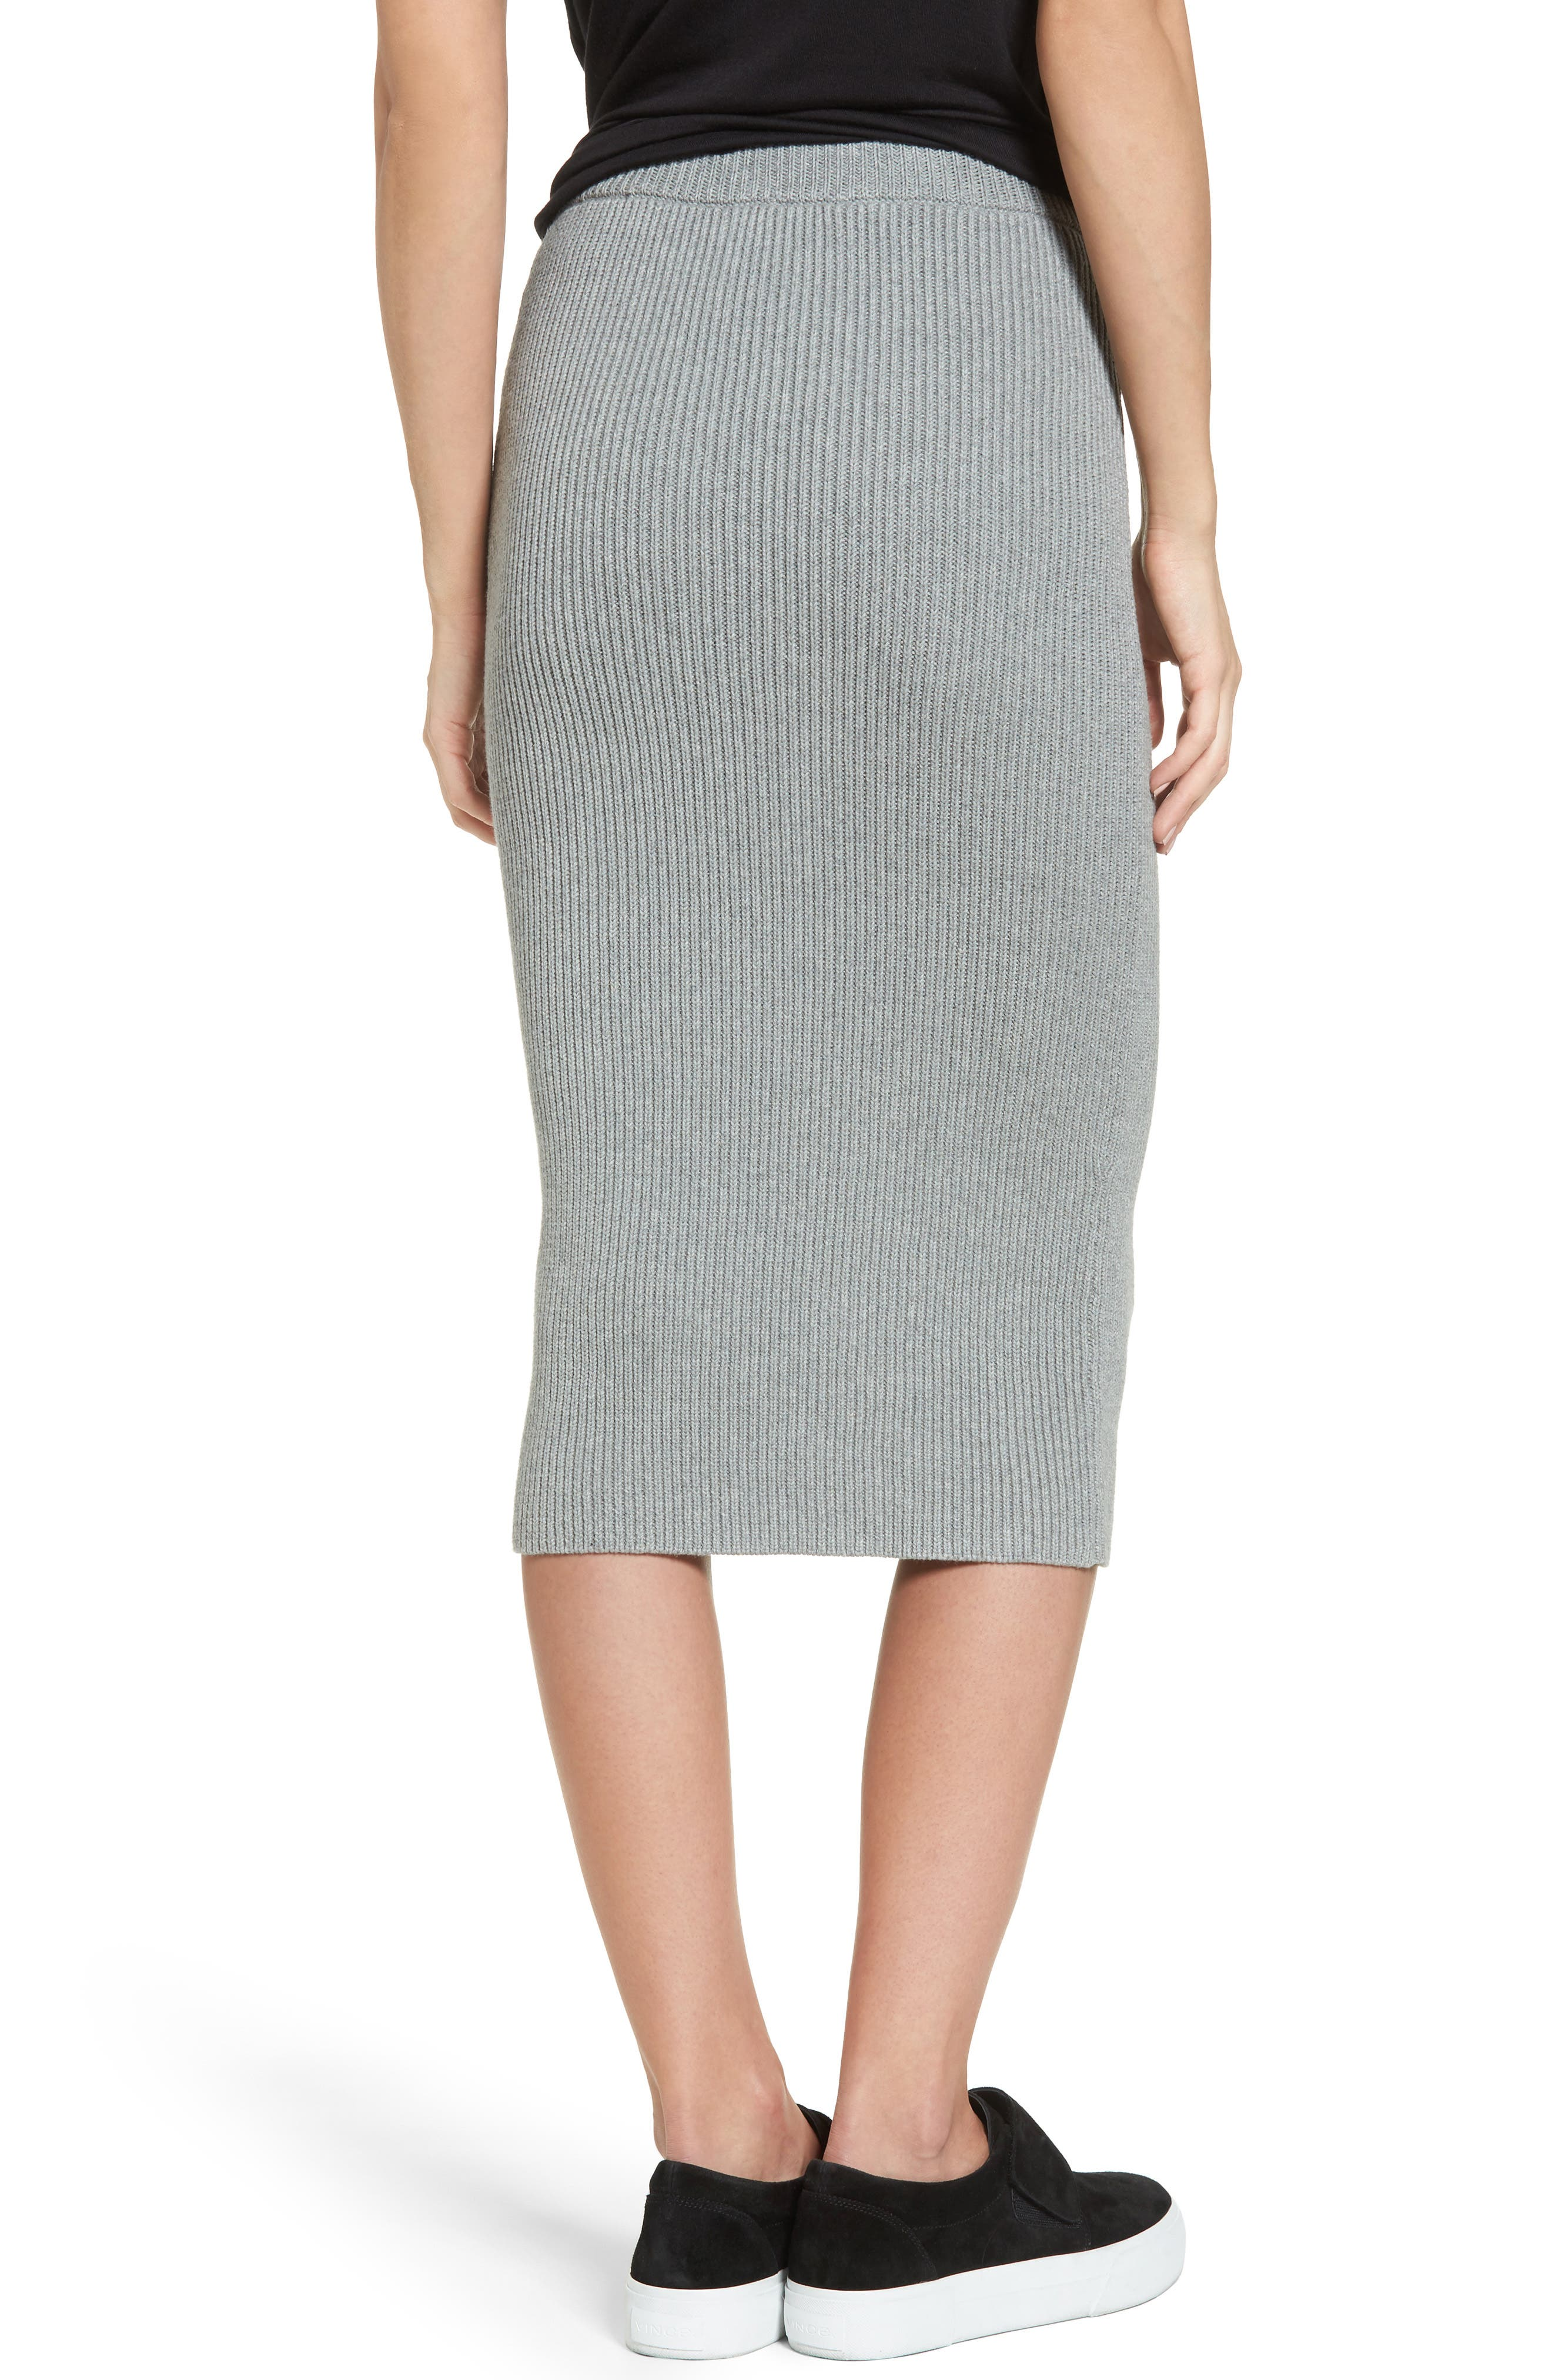 Galactic Knit Skirt,                             Alternate thumbnail 2, color,                             051